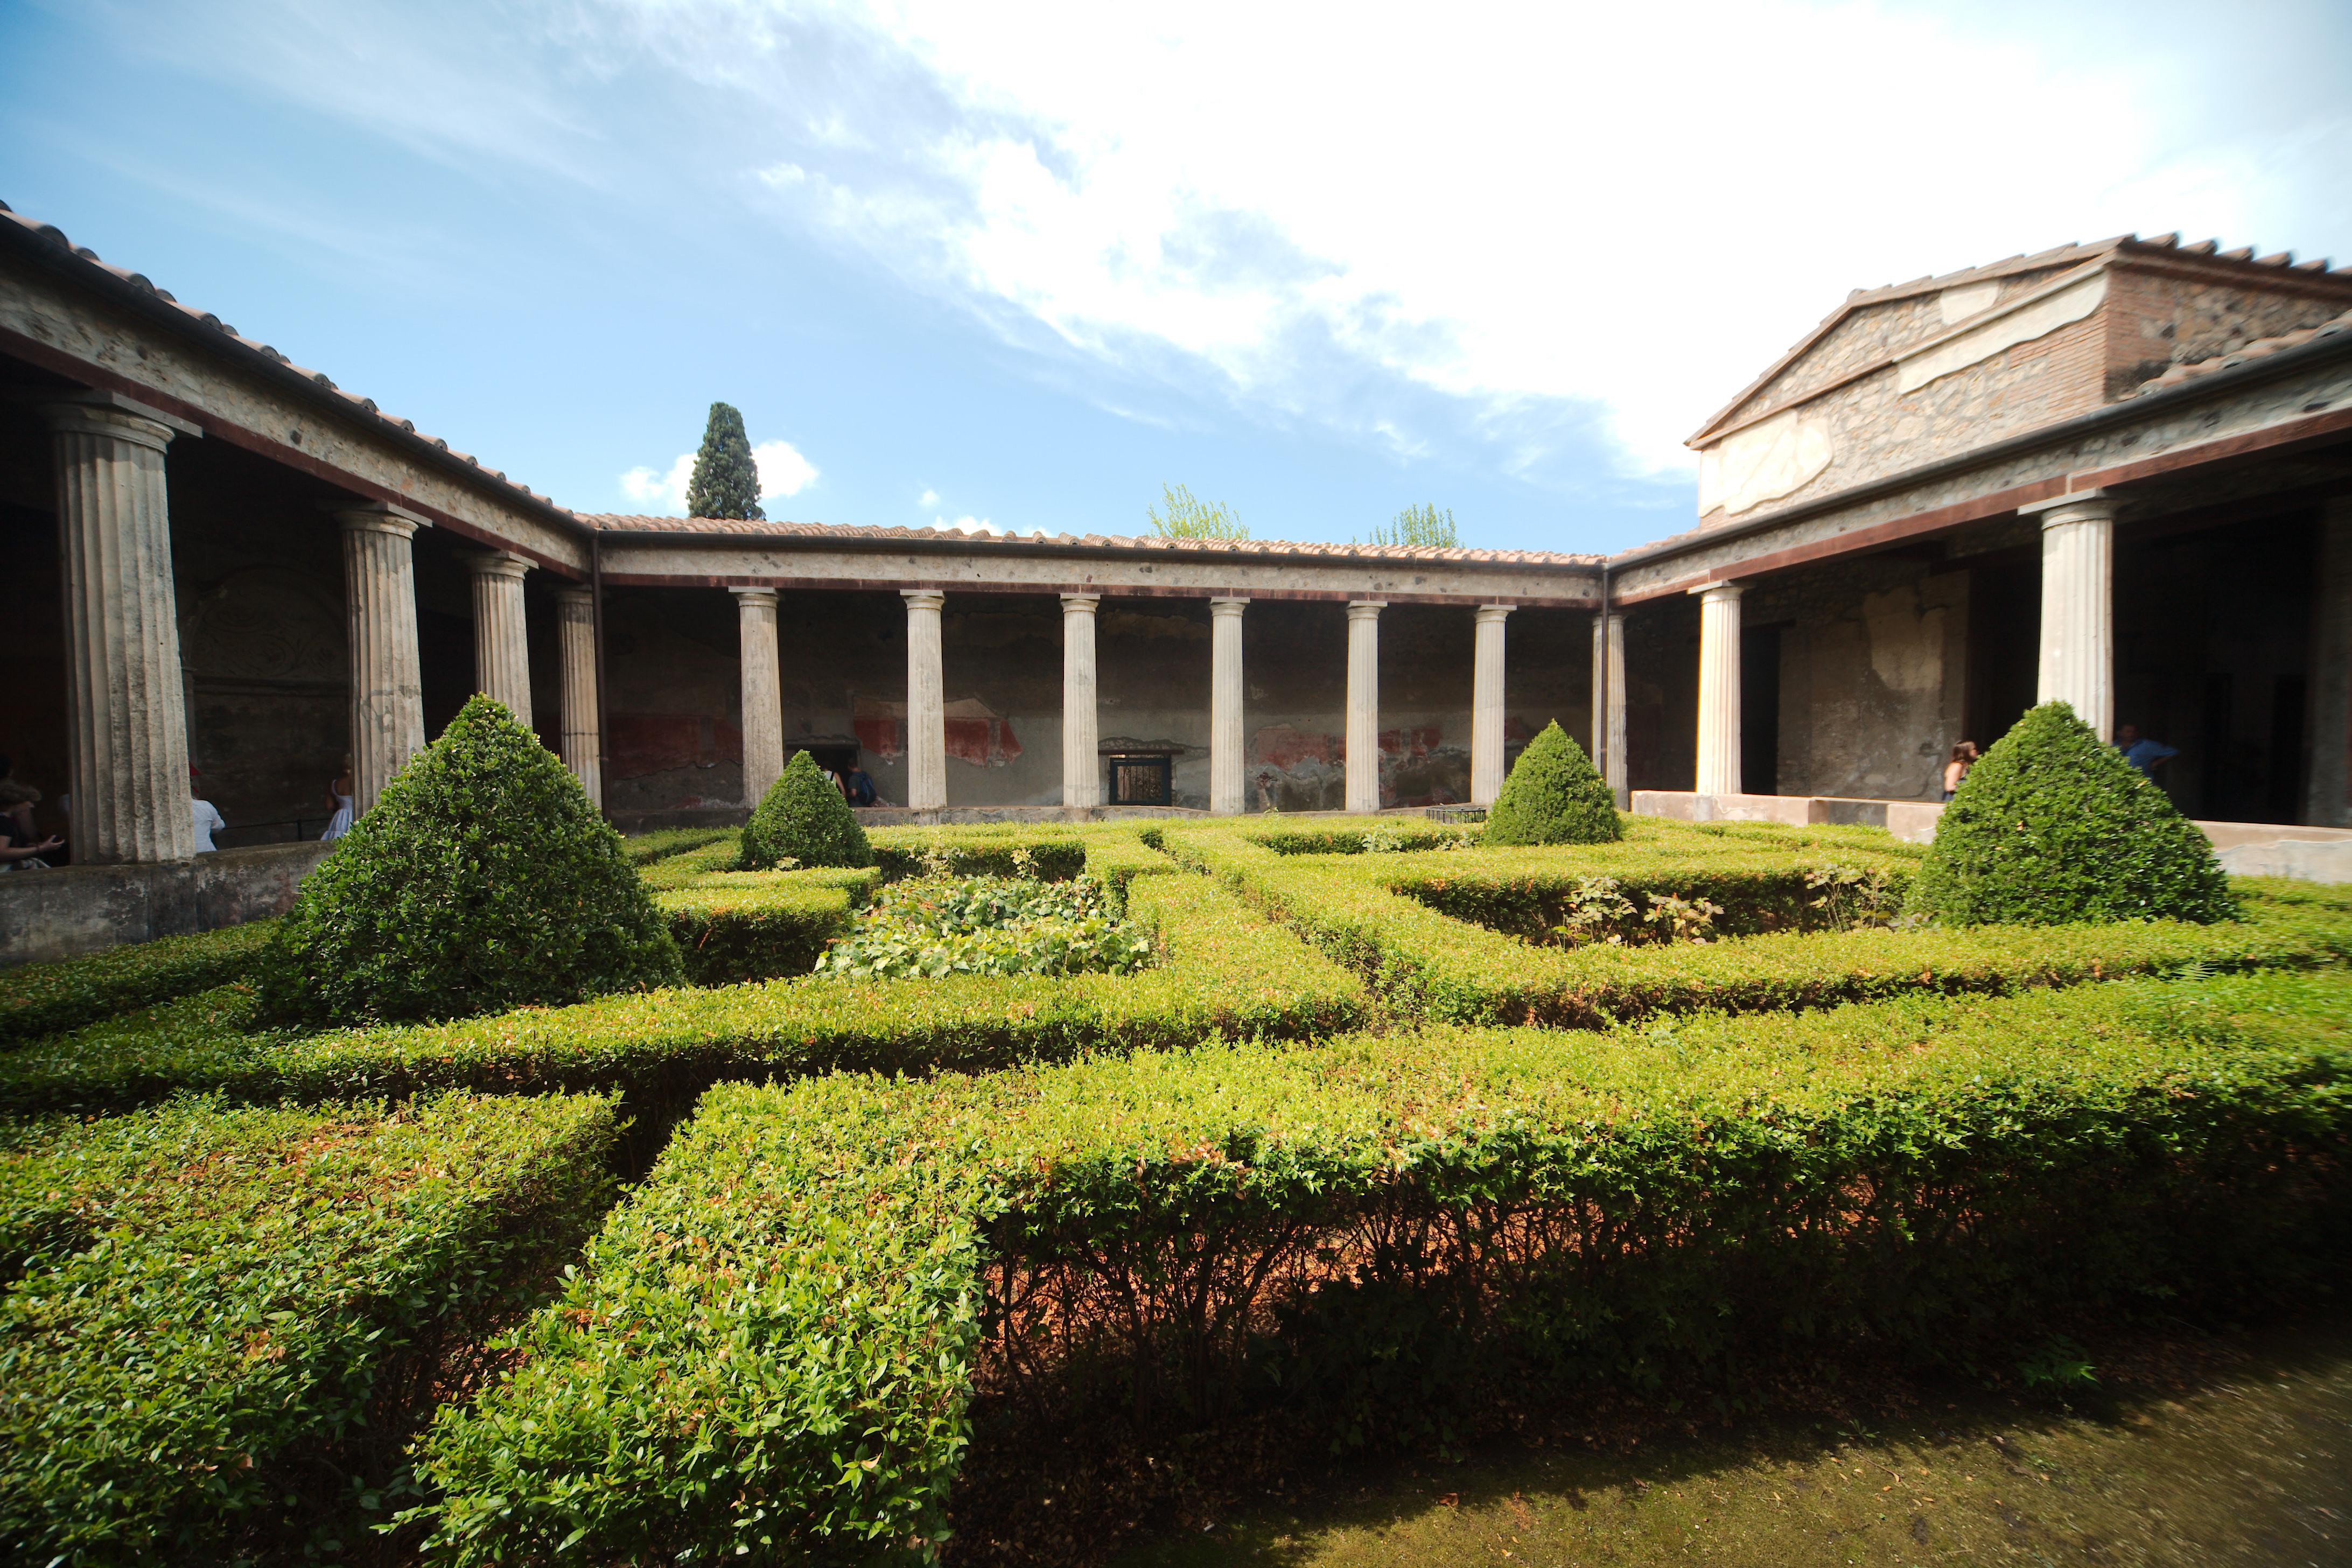 pompeii wikipedia upcomingcarshqcom